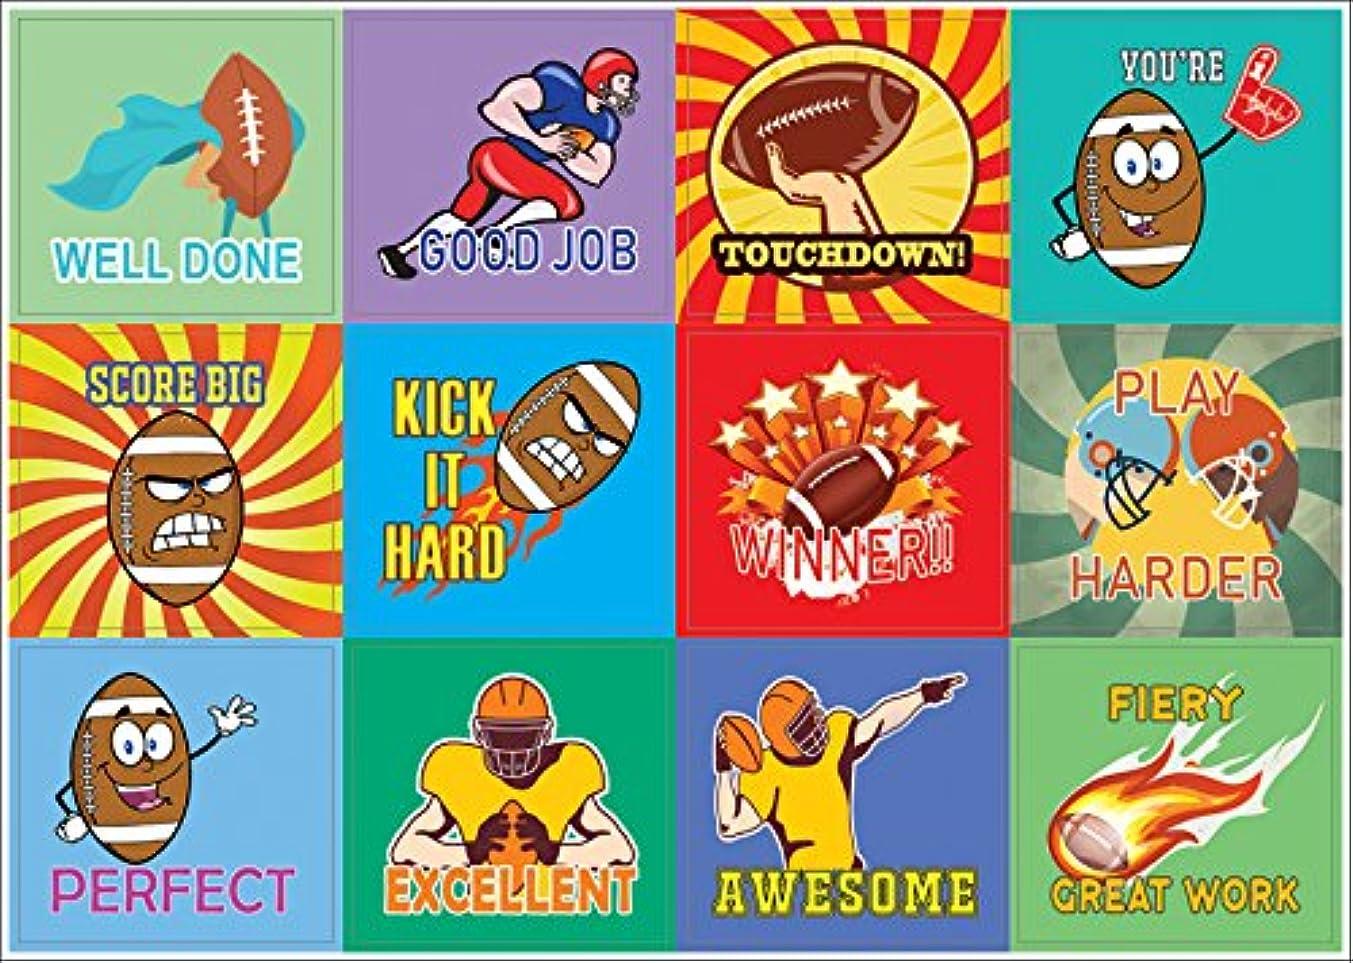 Sports Motivational American Football Stickers (10 Sheets) – Inspiring and Encouraging Words Sticker Decal Stocking Stuffers for Boys, Girls, Kids, Teens, Friends – Teacher Classroom Rewards Incentive